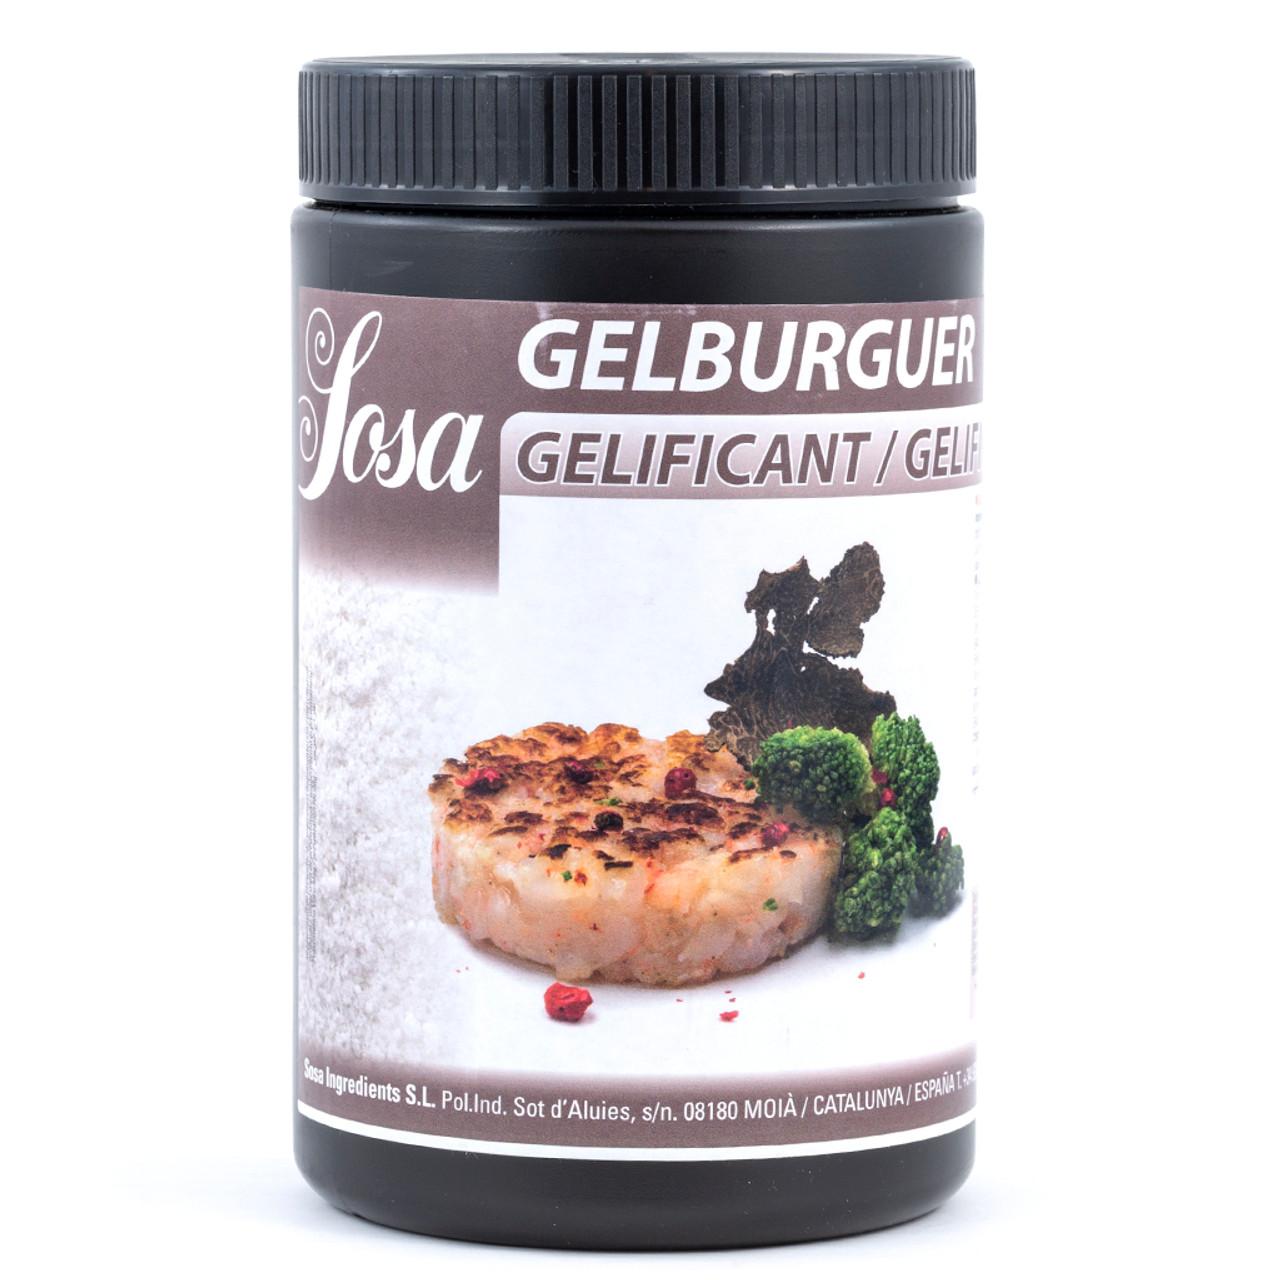 Sosa Gelburger 500g